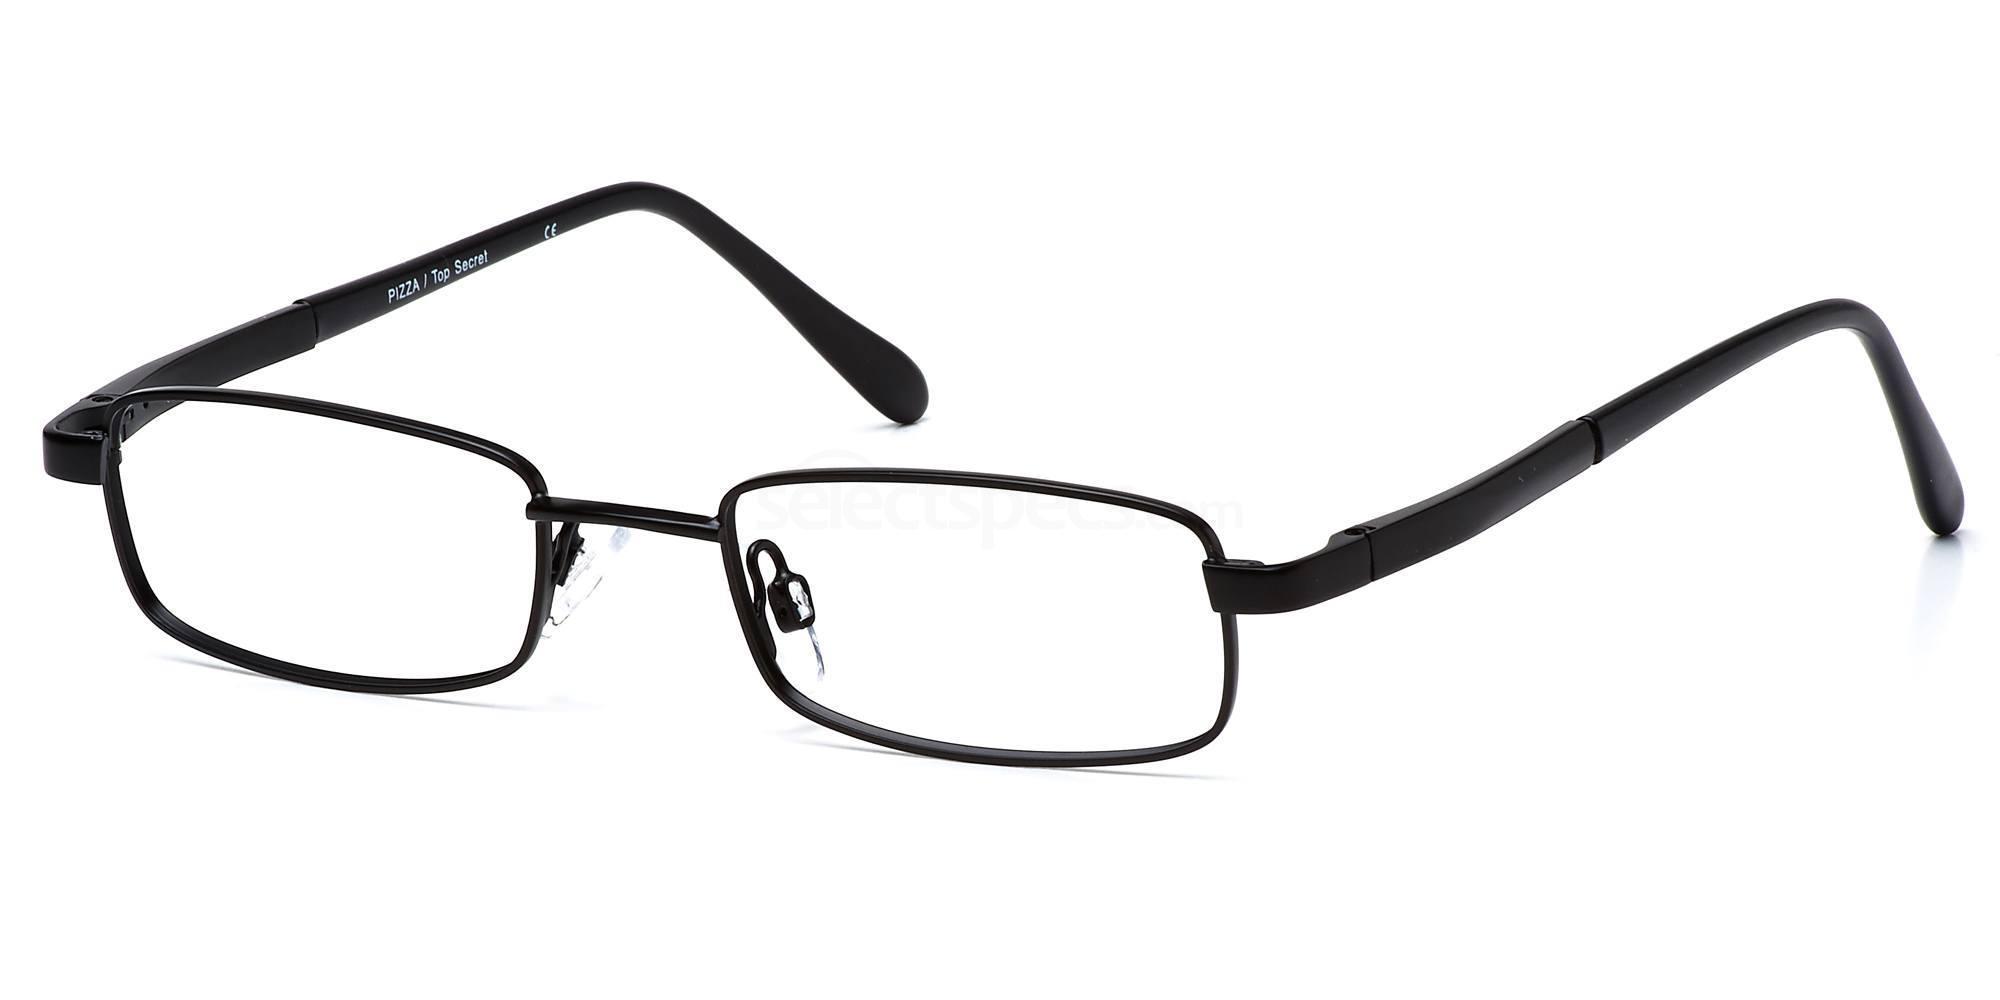 C1 PIZZA Glasses, Top Secret KIDS